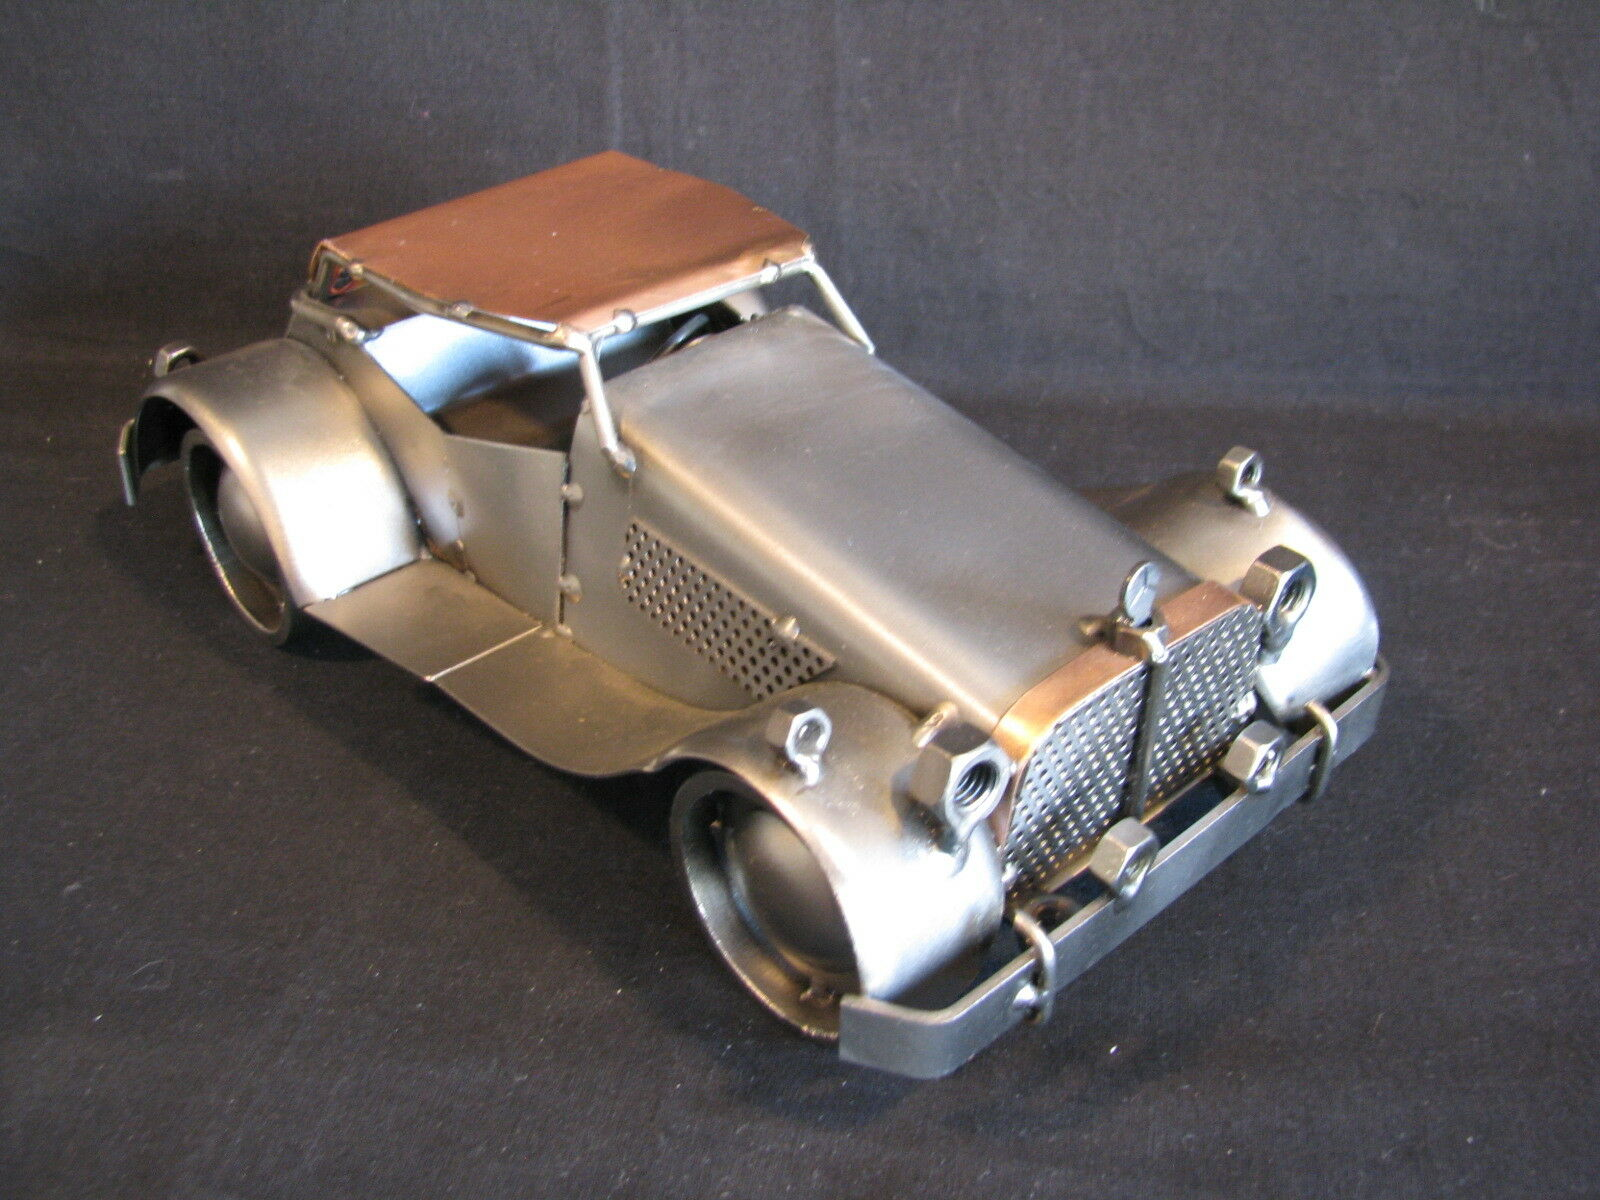 Metal Sculpture Mercedes-Benz (plm 1:18) Design Hinz & Kunse Das Original (JS)